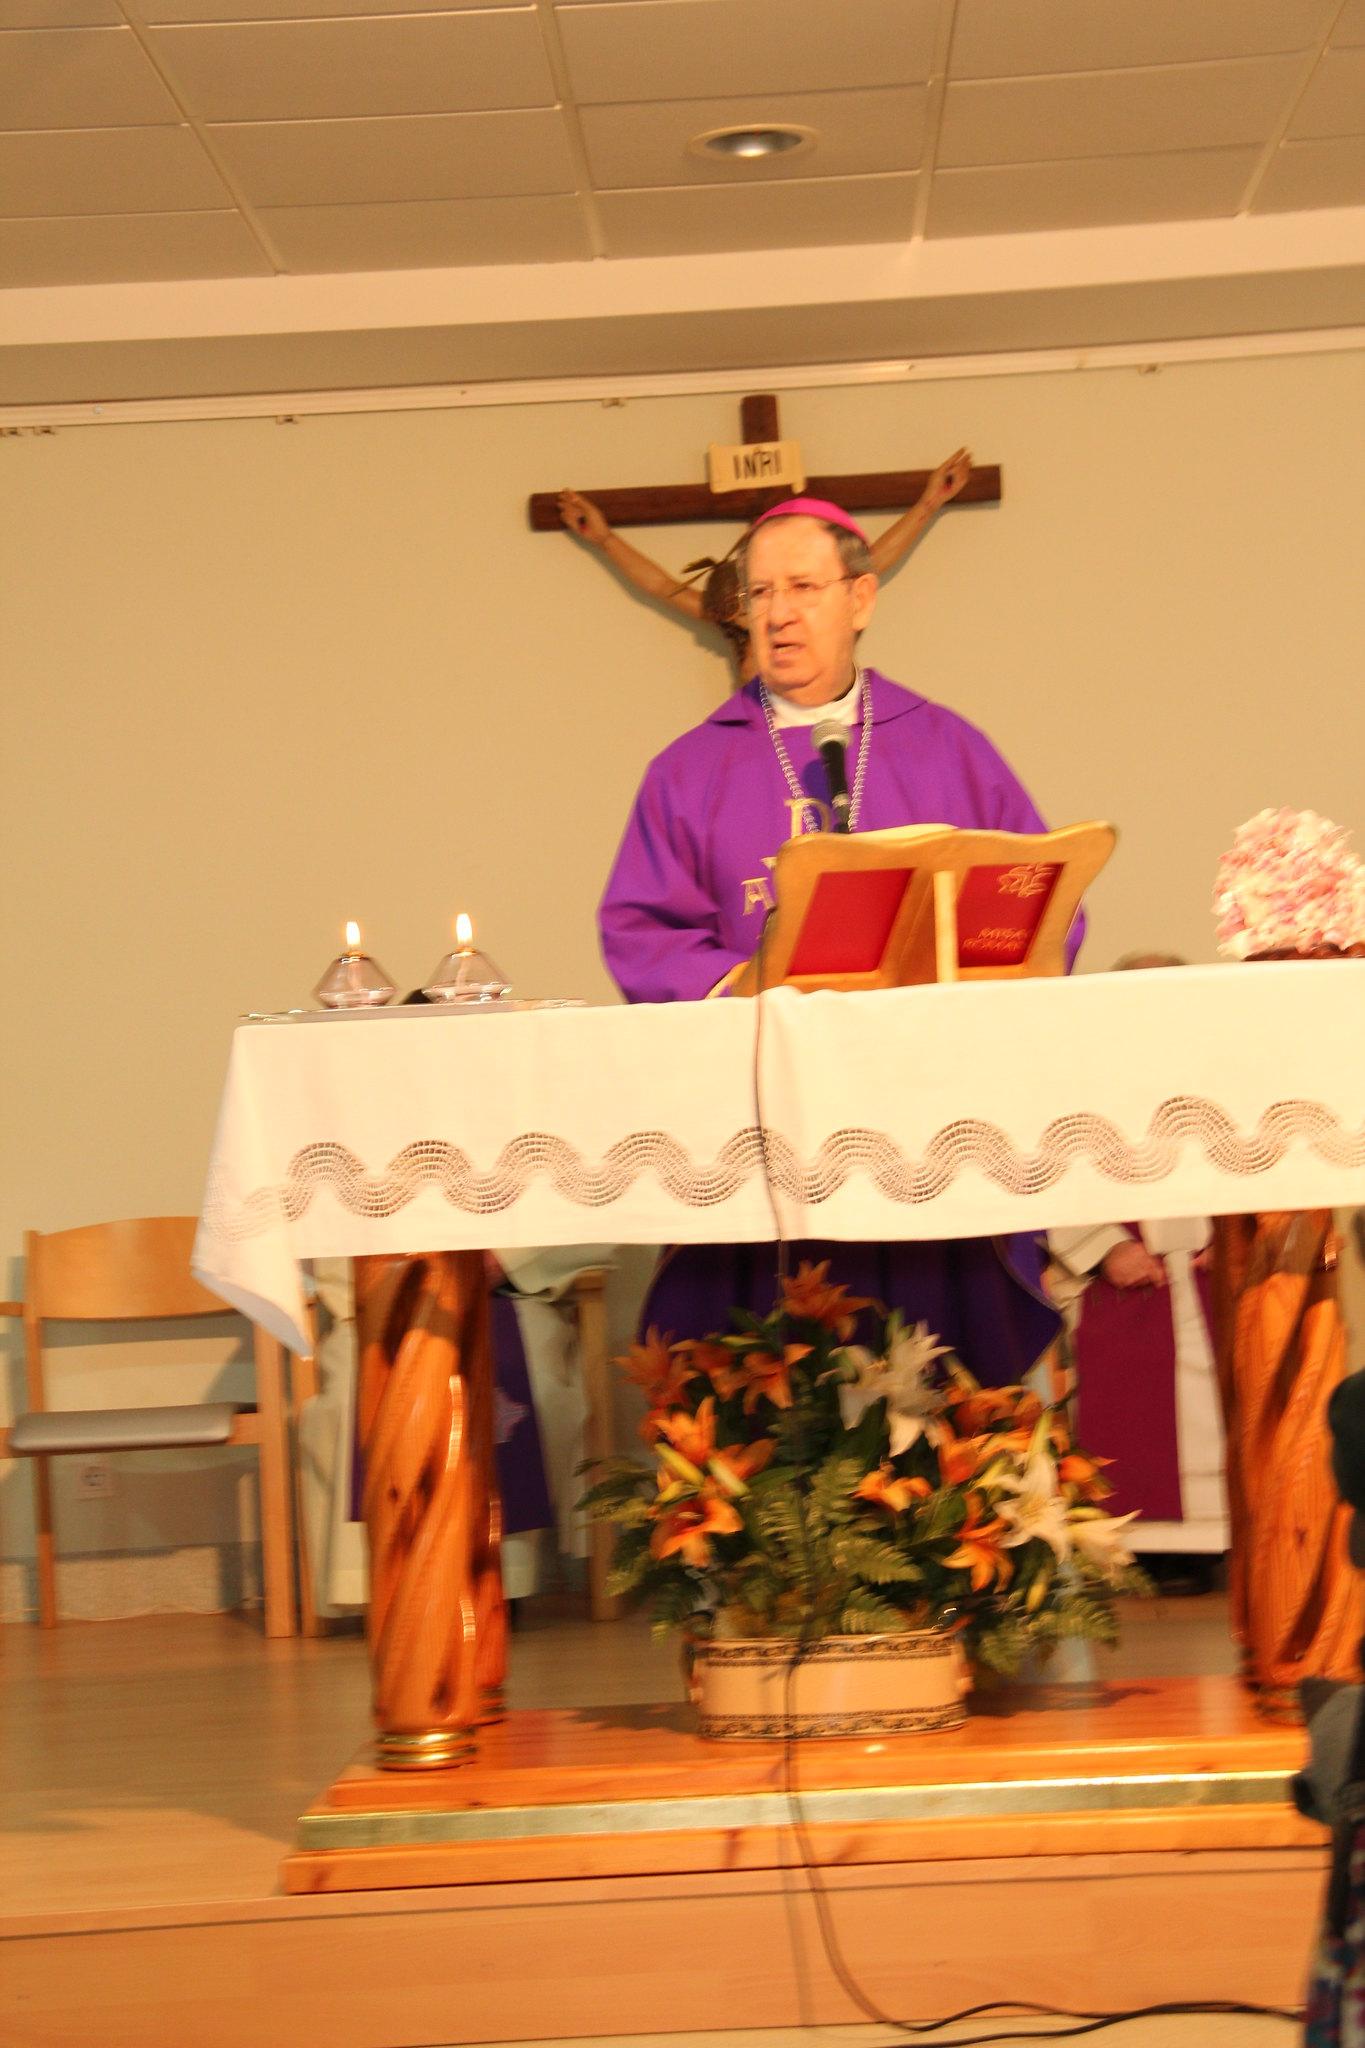 (2016-02-13) - Inauguración Virgen De Lourdes, La Molineta - Archivo La Molineta (019)